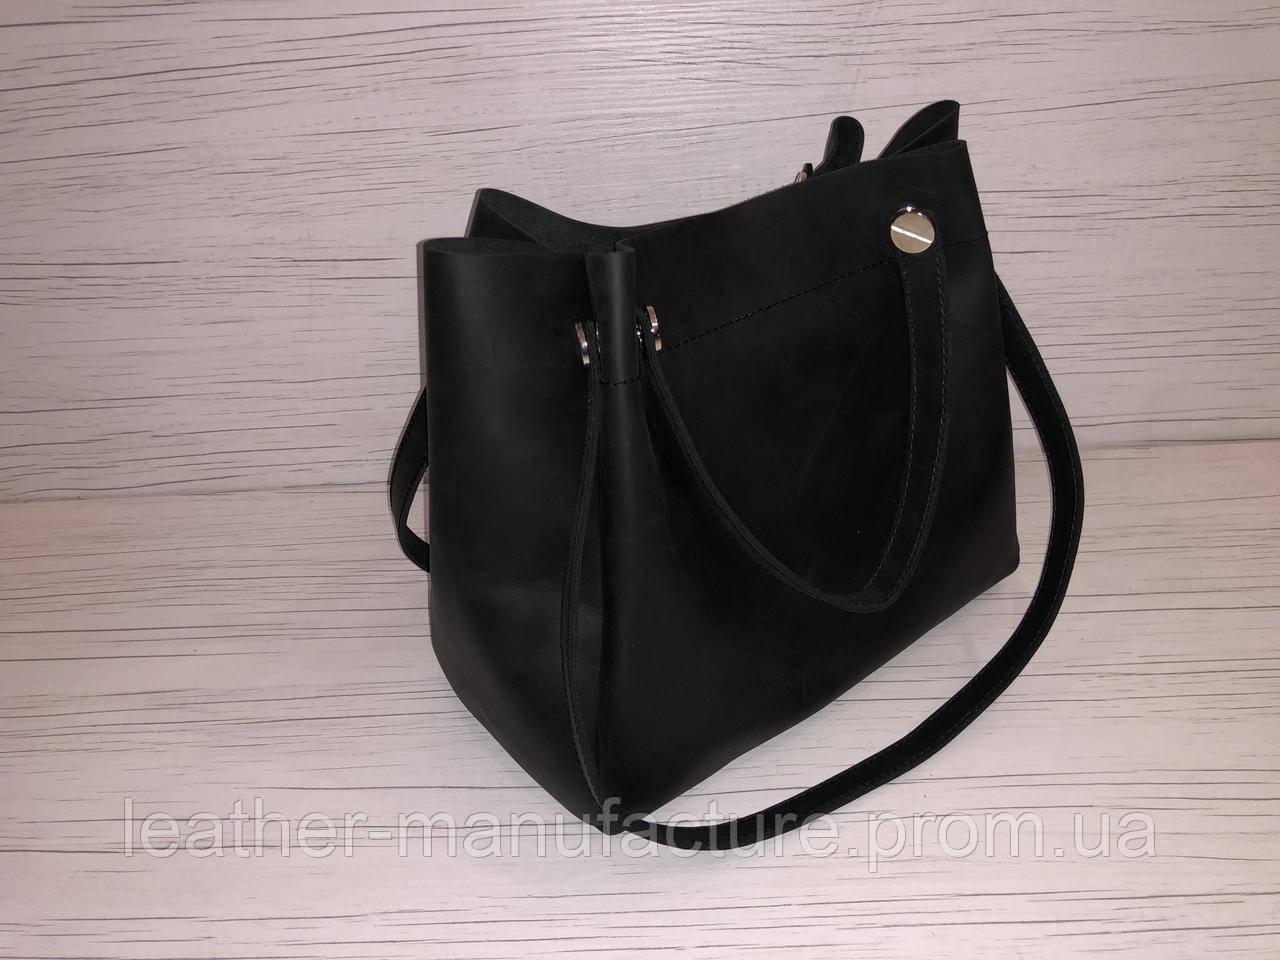 5f342171beac32 Сумка жіноча, шкіряна, чорна. Ananda - Art Leather Group - Arturo  collection &